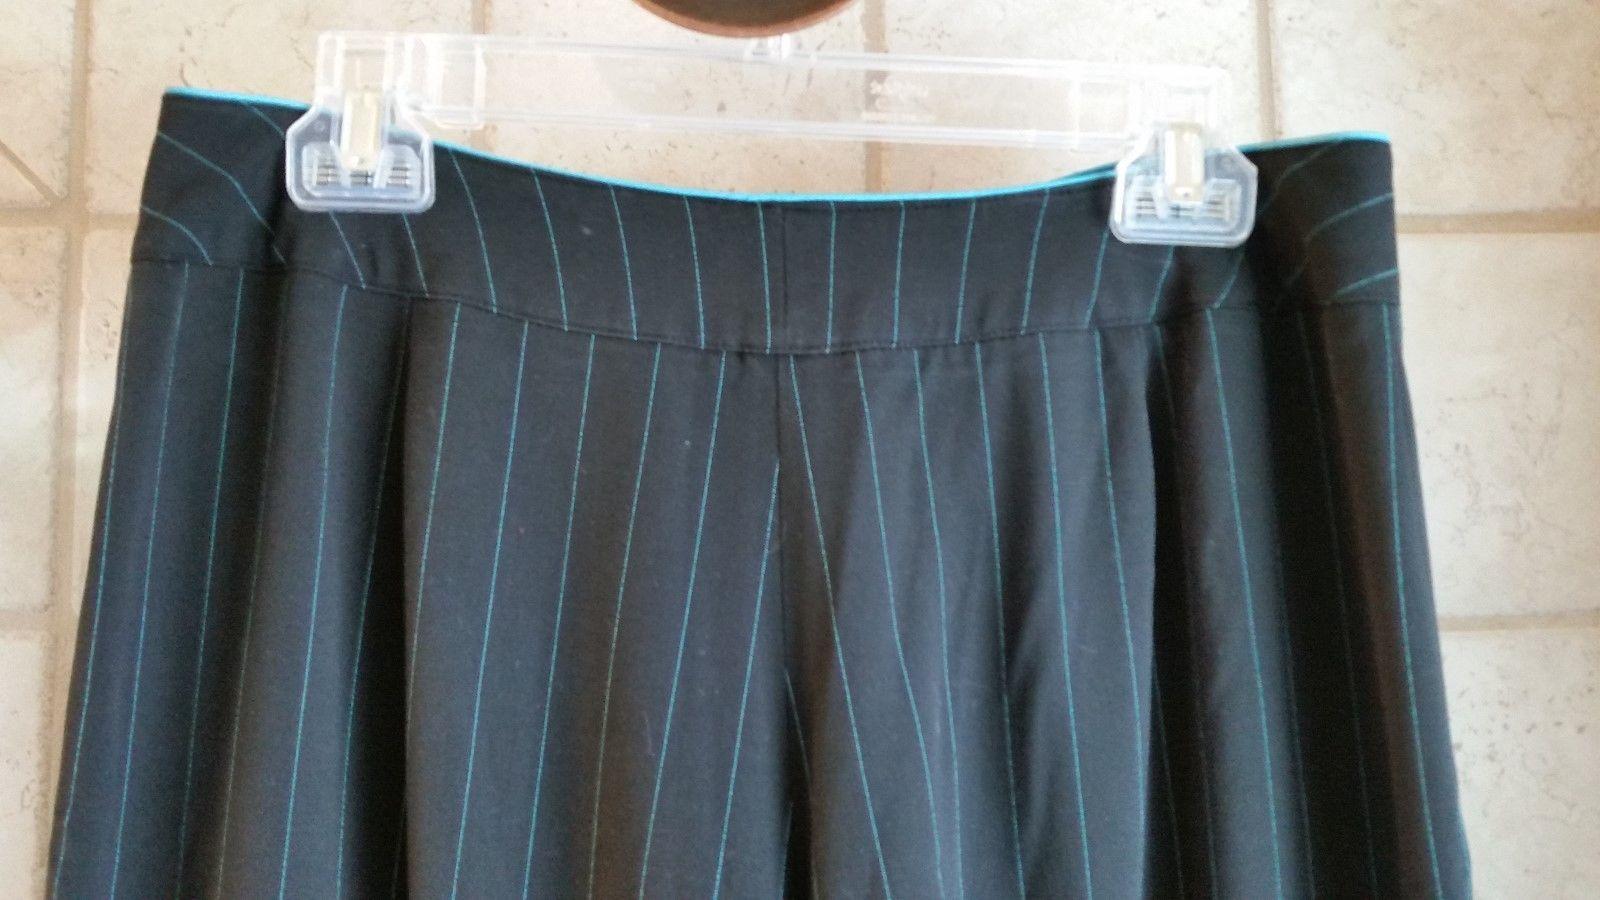 Women's Sz 10 Larry Levine Stretch Dress Pants - Black with Turquoise pinstripes